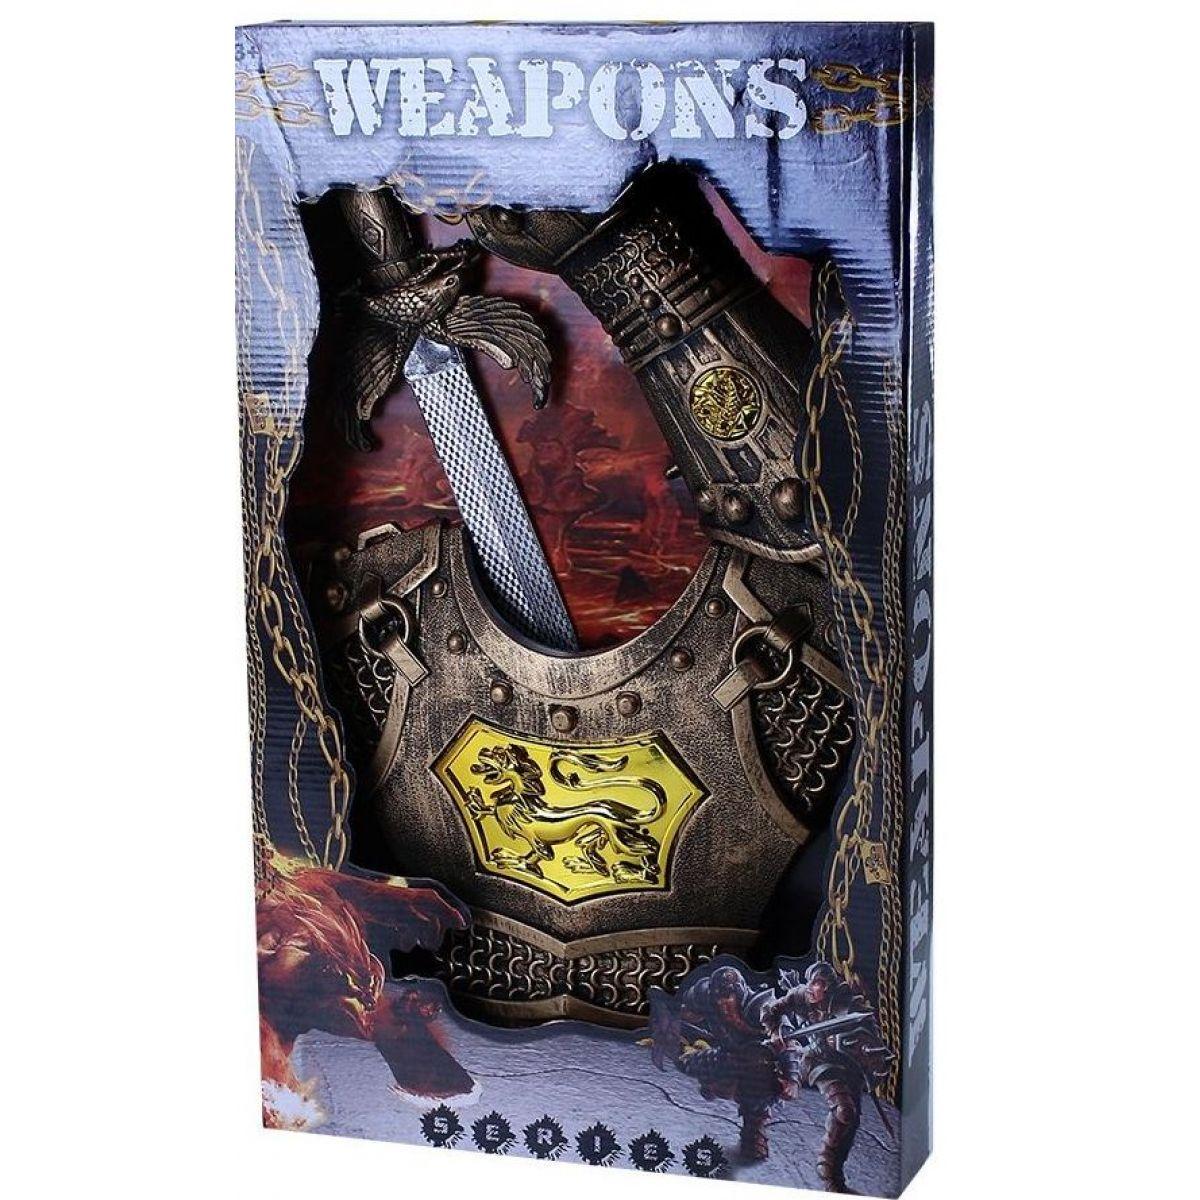 Rappa sada rytířská s mečem, štítem na hruď a ochranou na ruku